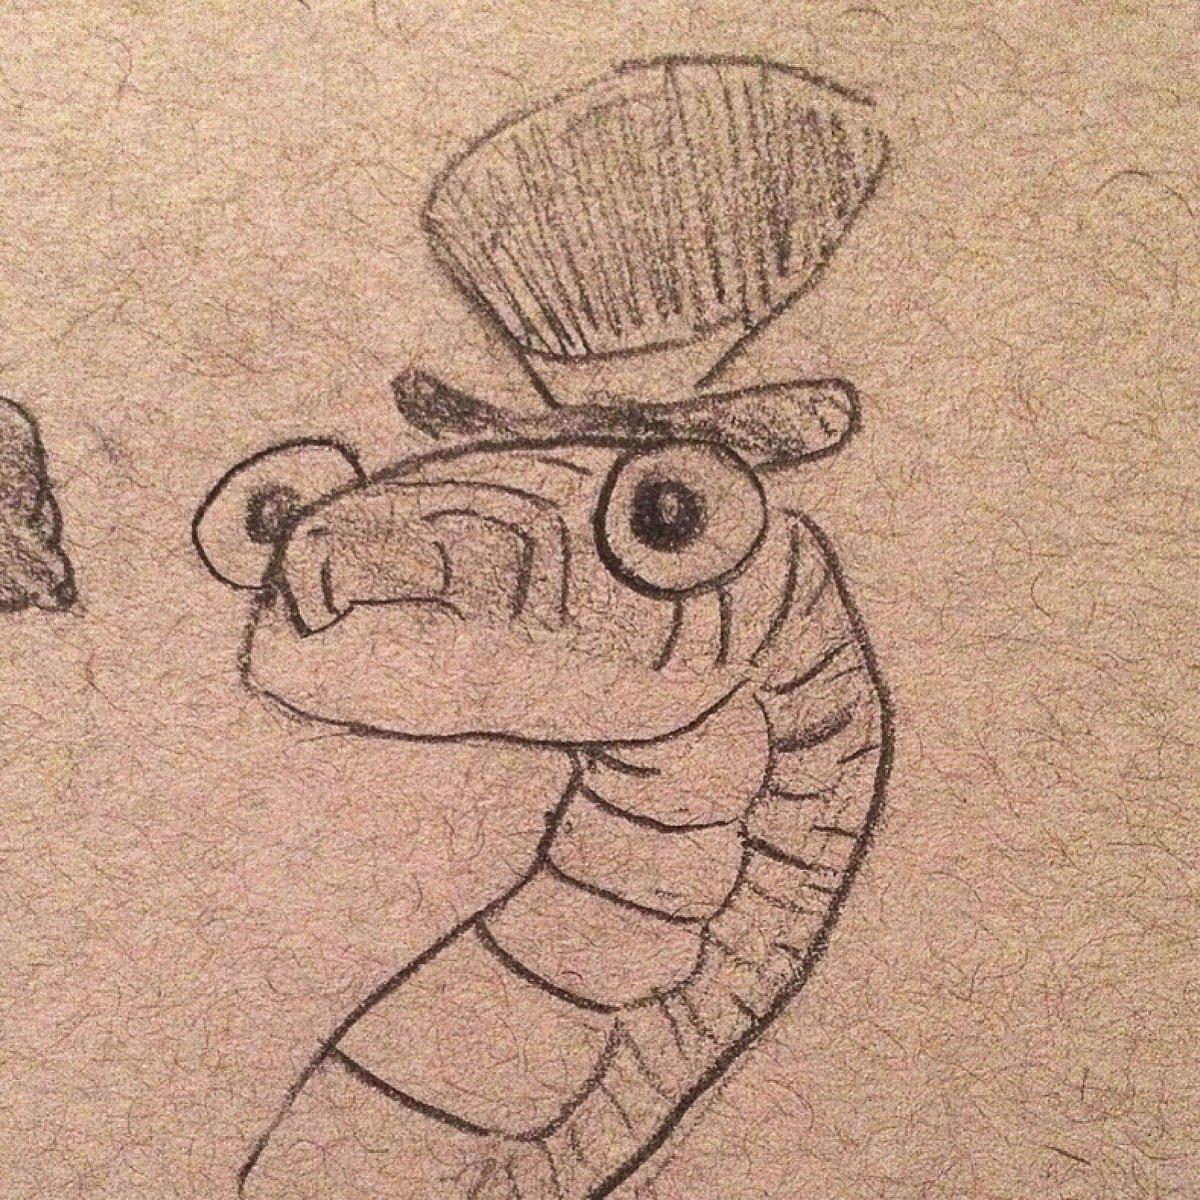 Snake with a hat  #art #drawing #animal #snake #cartoon #hat #cute #snakedrawing #sketch #sketchbook #reptile